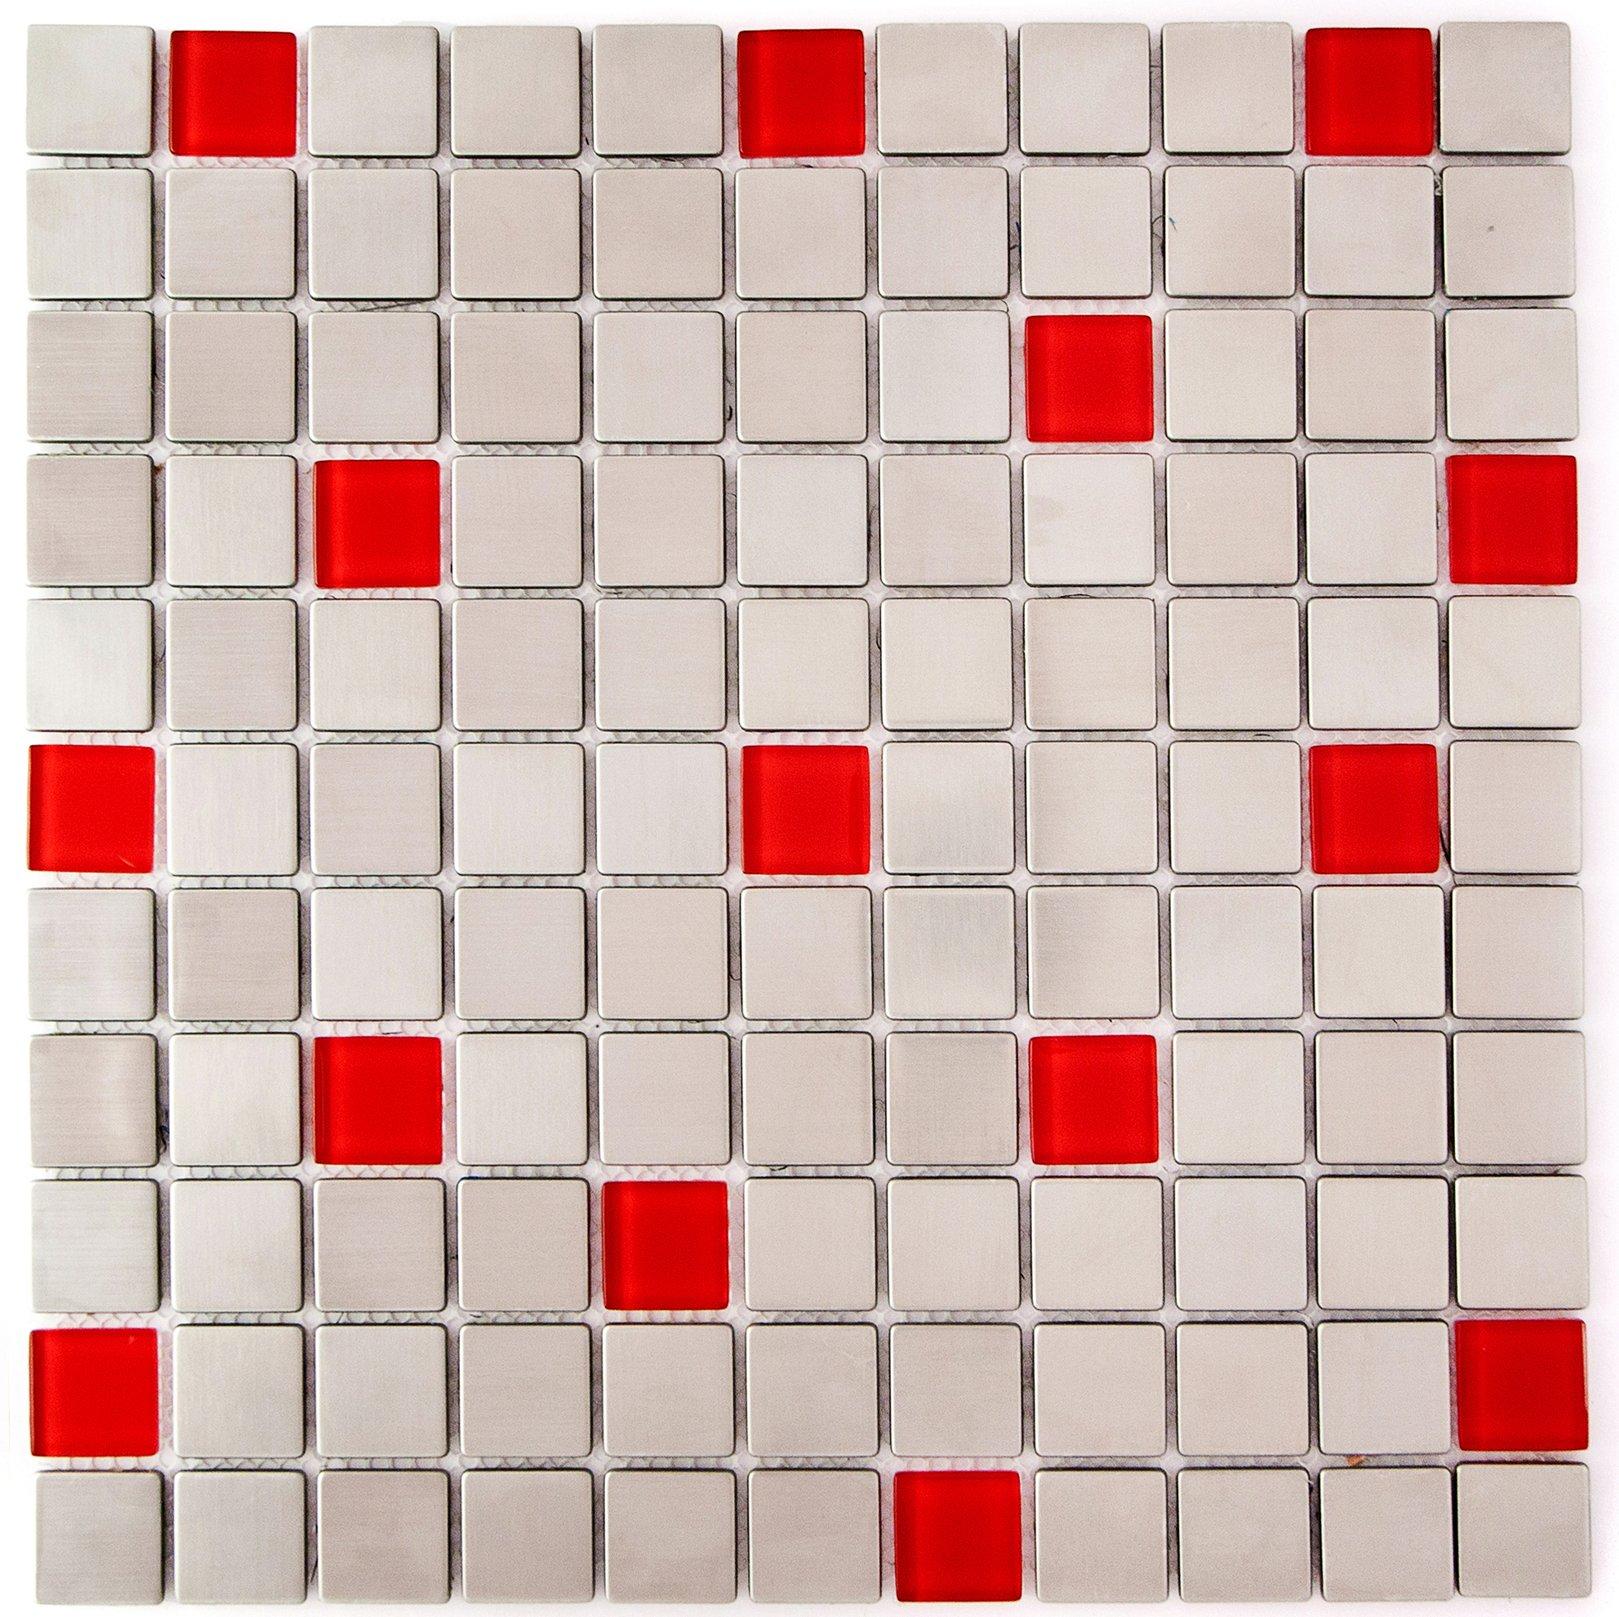 Glass Steel Mosaic Tile Backsplash - 11.50'' x11.50'' Red - Kitchen Bath Wall